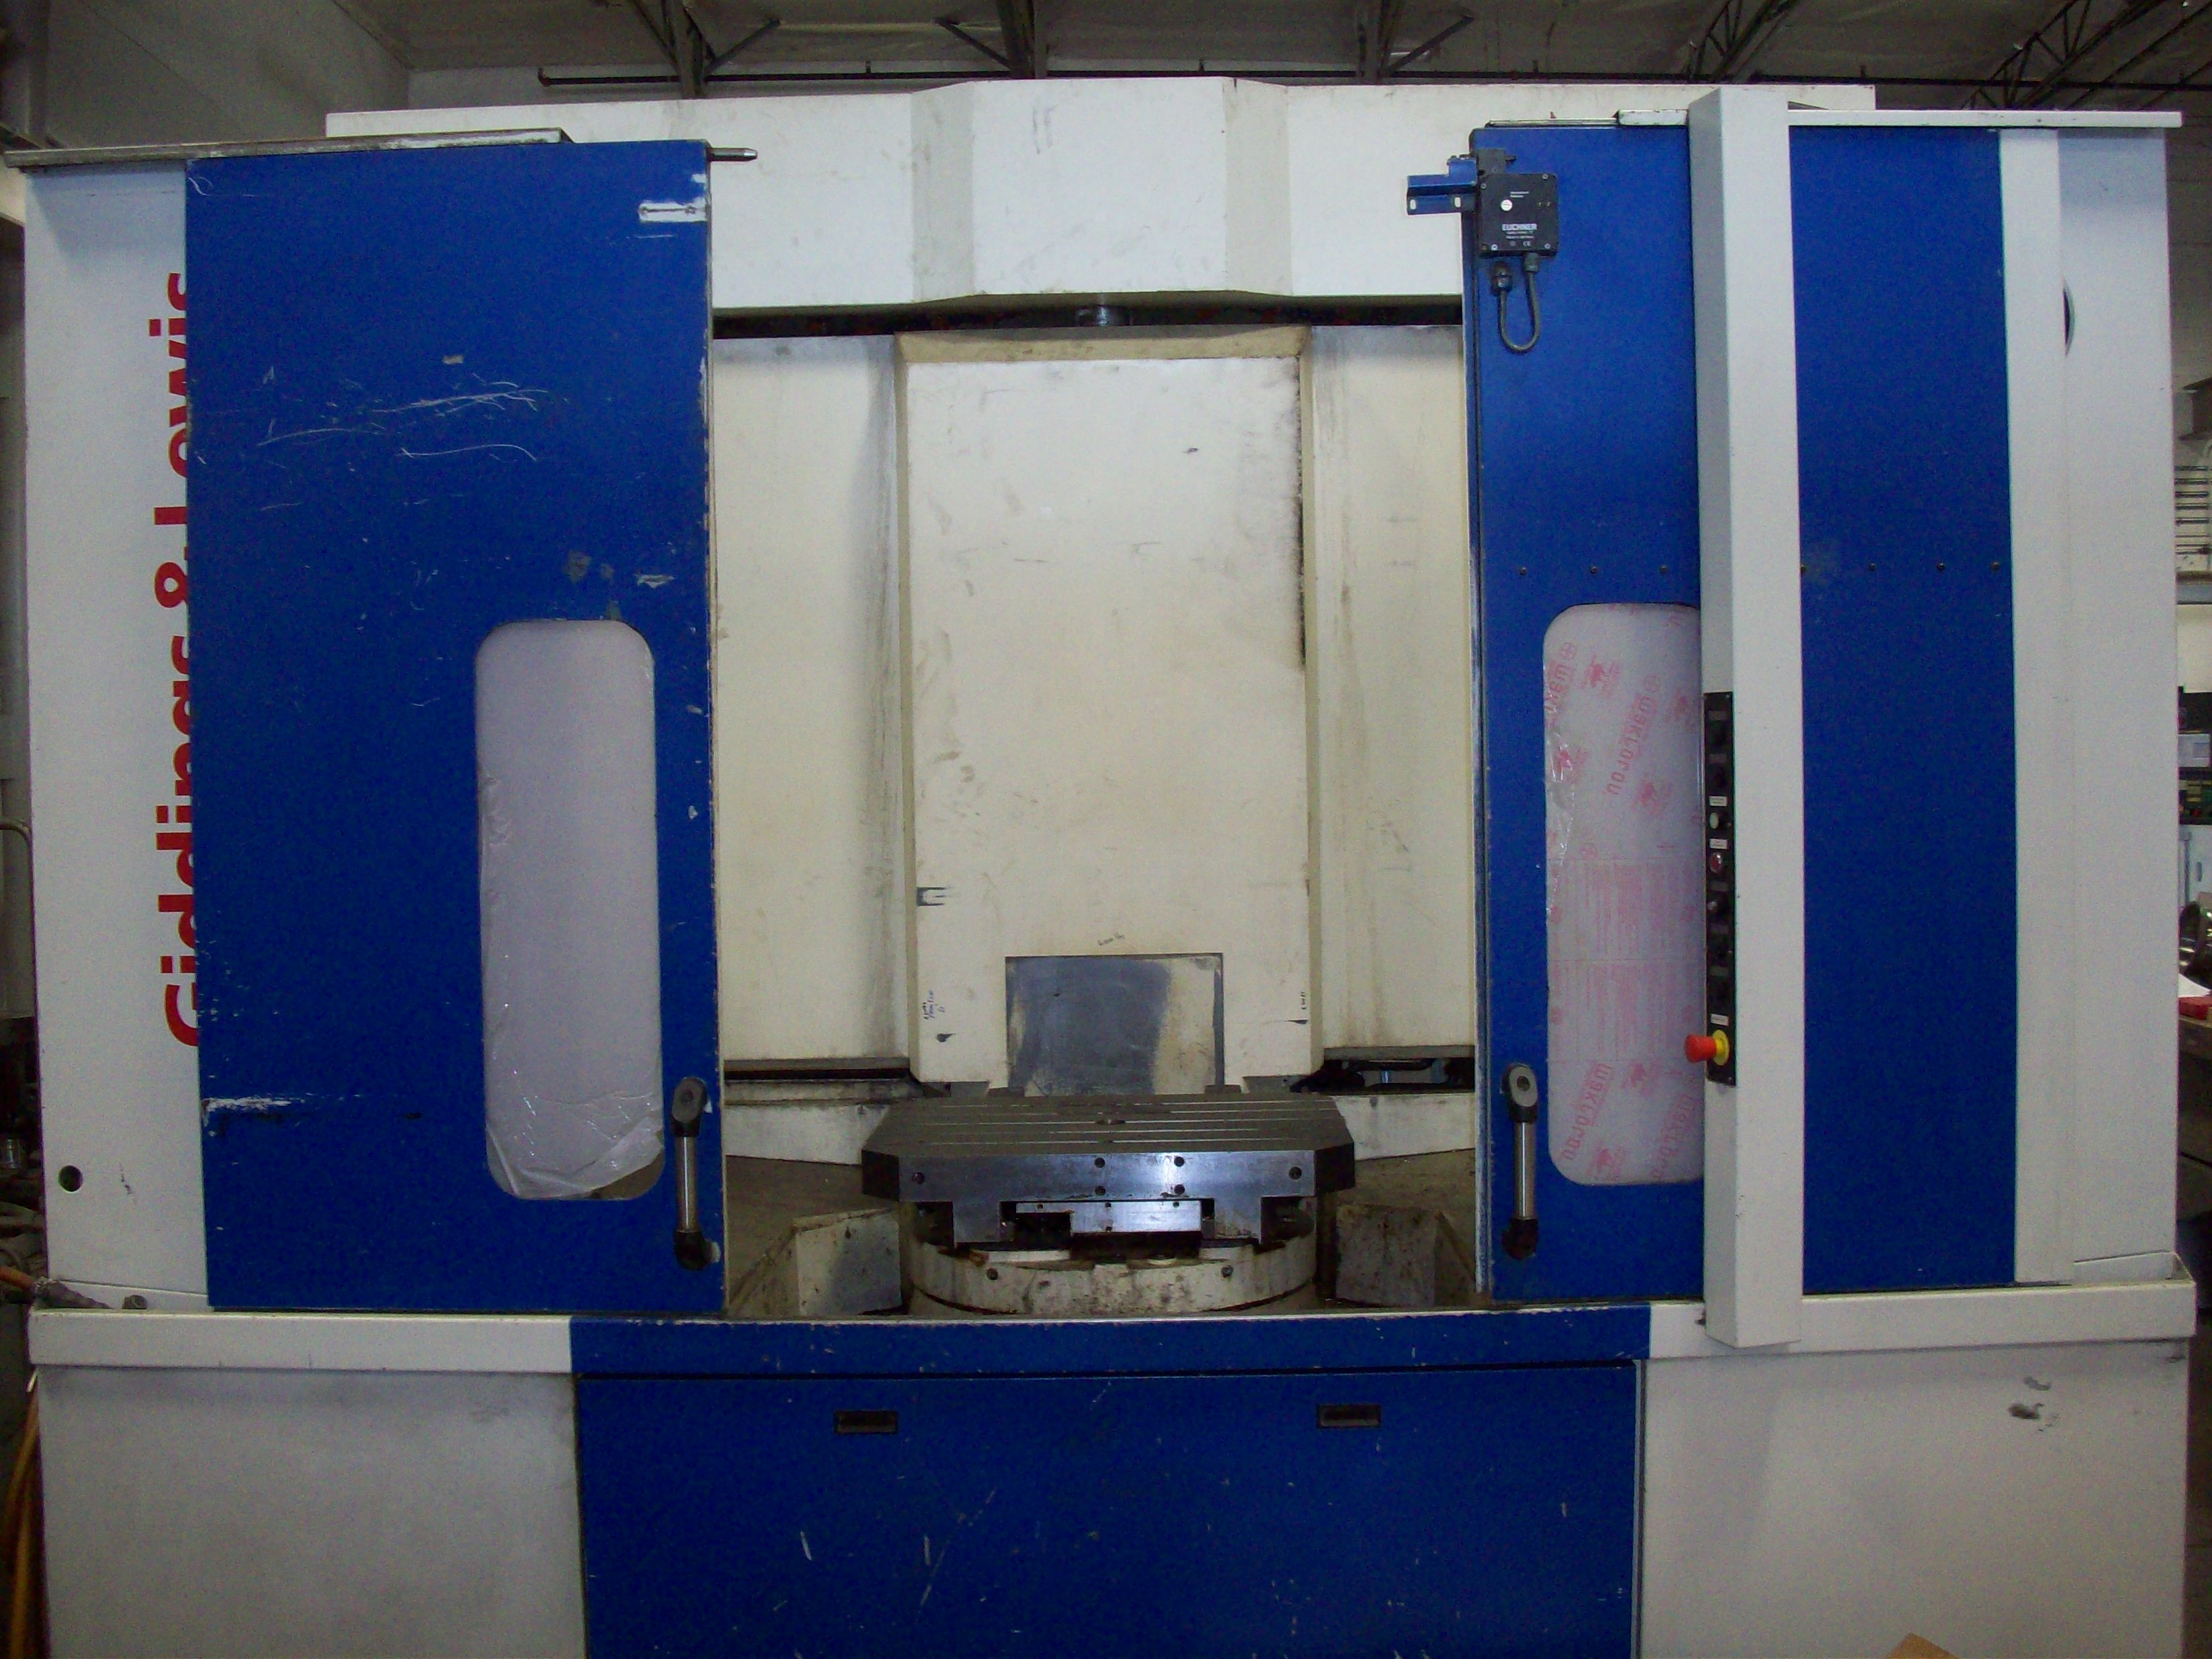 "G&L HMC-230 HMC, 47""x39""x39"", 31.5""x24.8"" Pallets, Full 4th, 50 Taper, 6K RPM, Fanuc 160i-MB Control, Chip Conveyor, Tooling!"